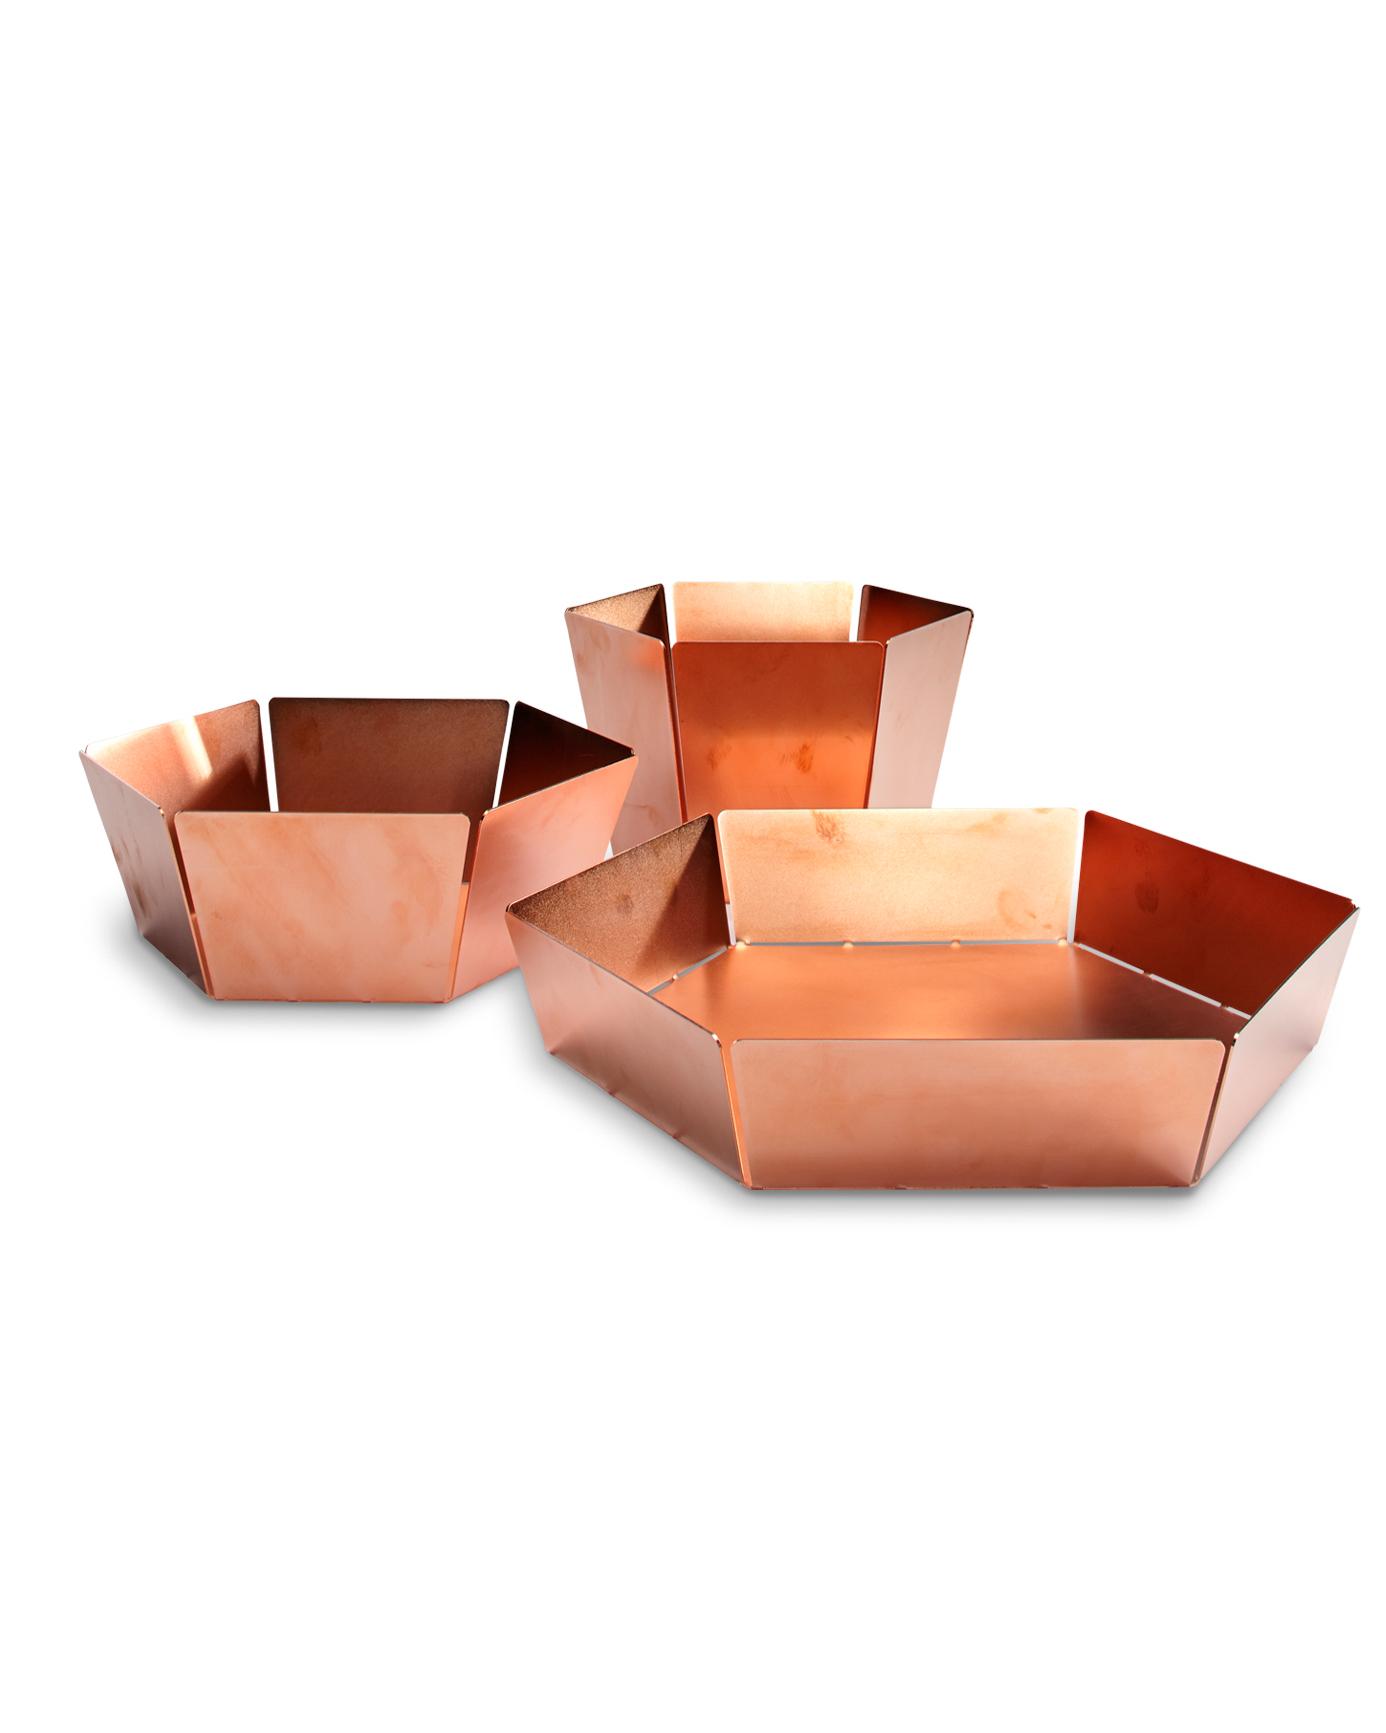 copper-registry-2d3d-bowl-0116.jpg